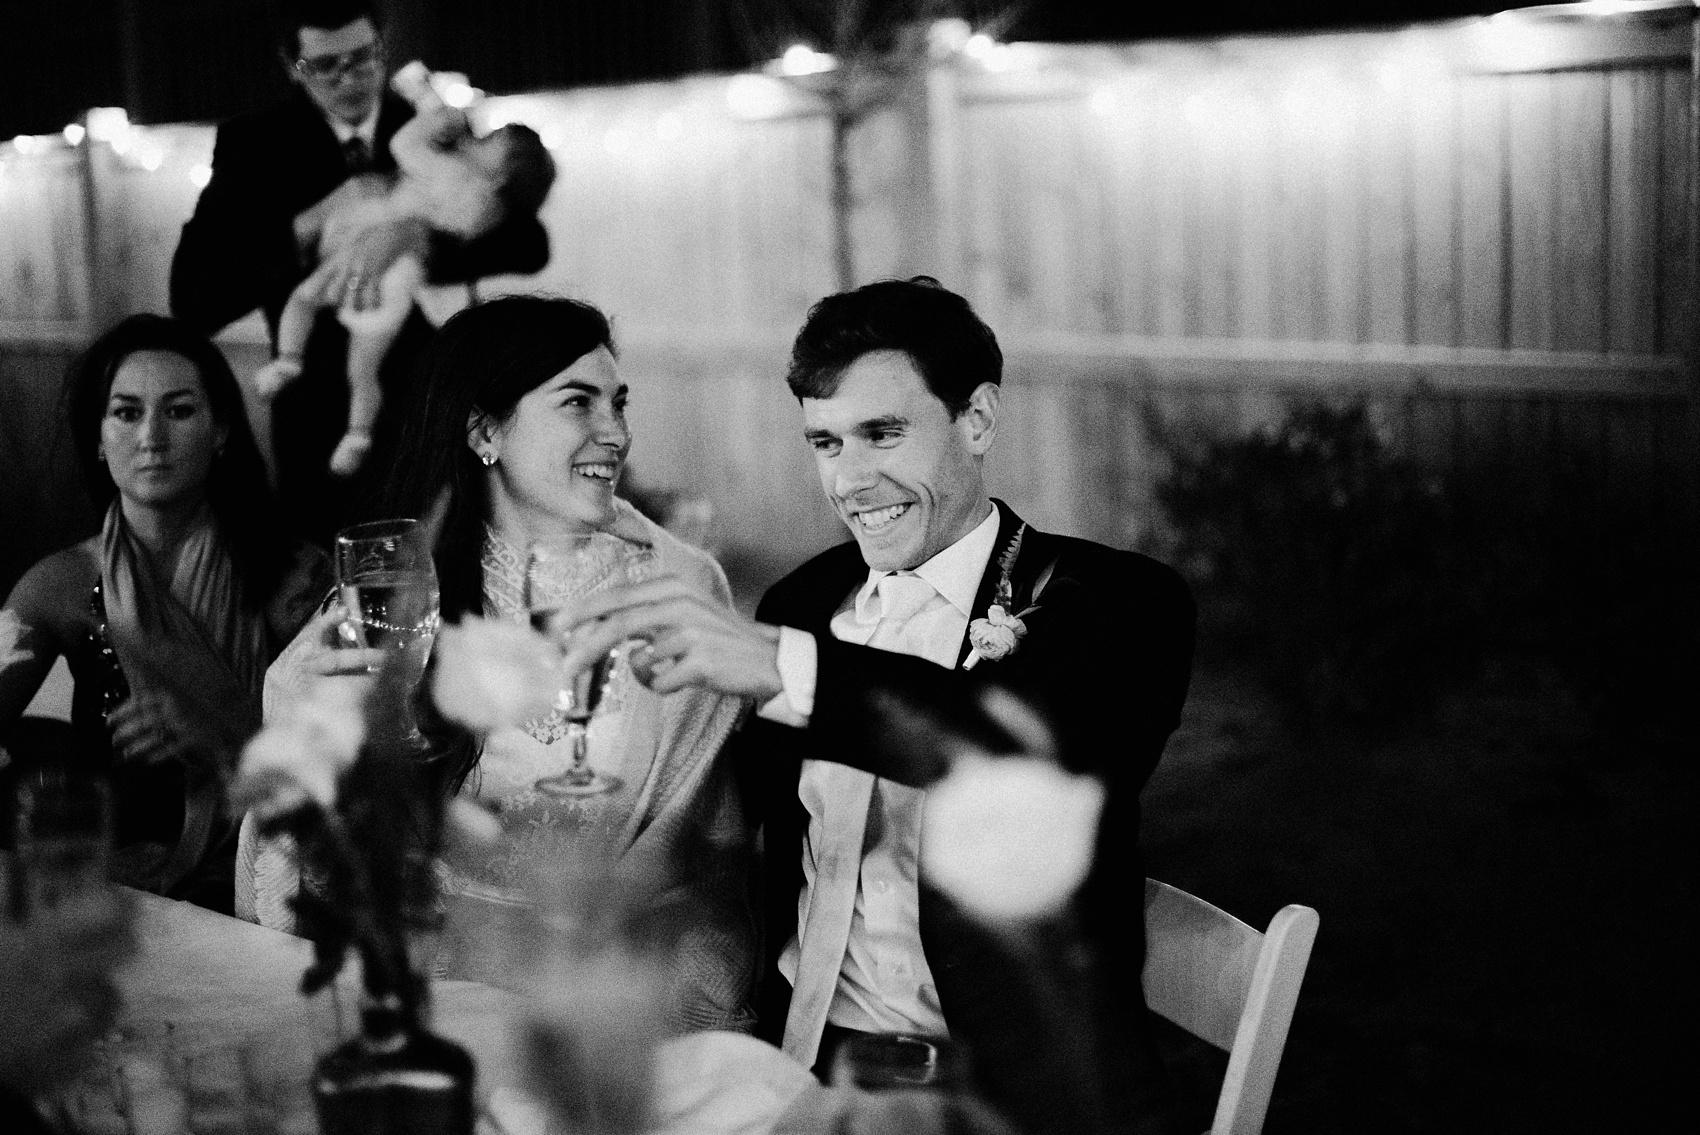 outerbanks_wedding_photographer_1332.jpg